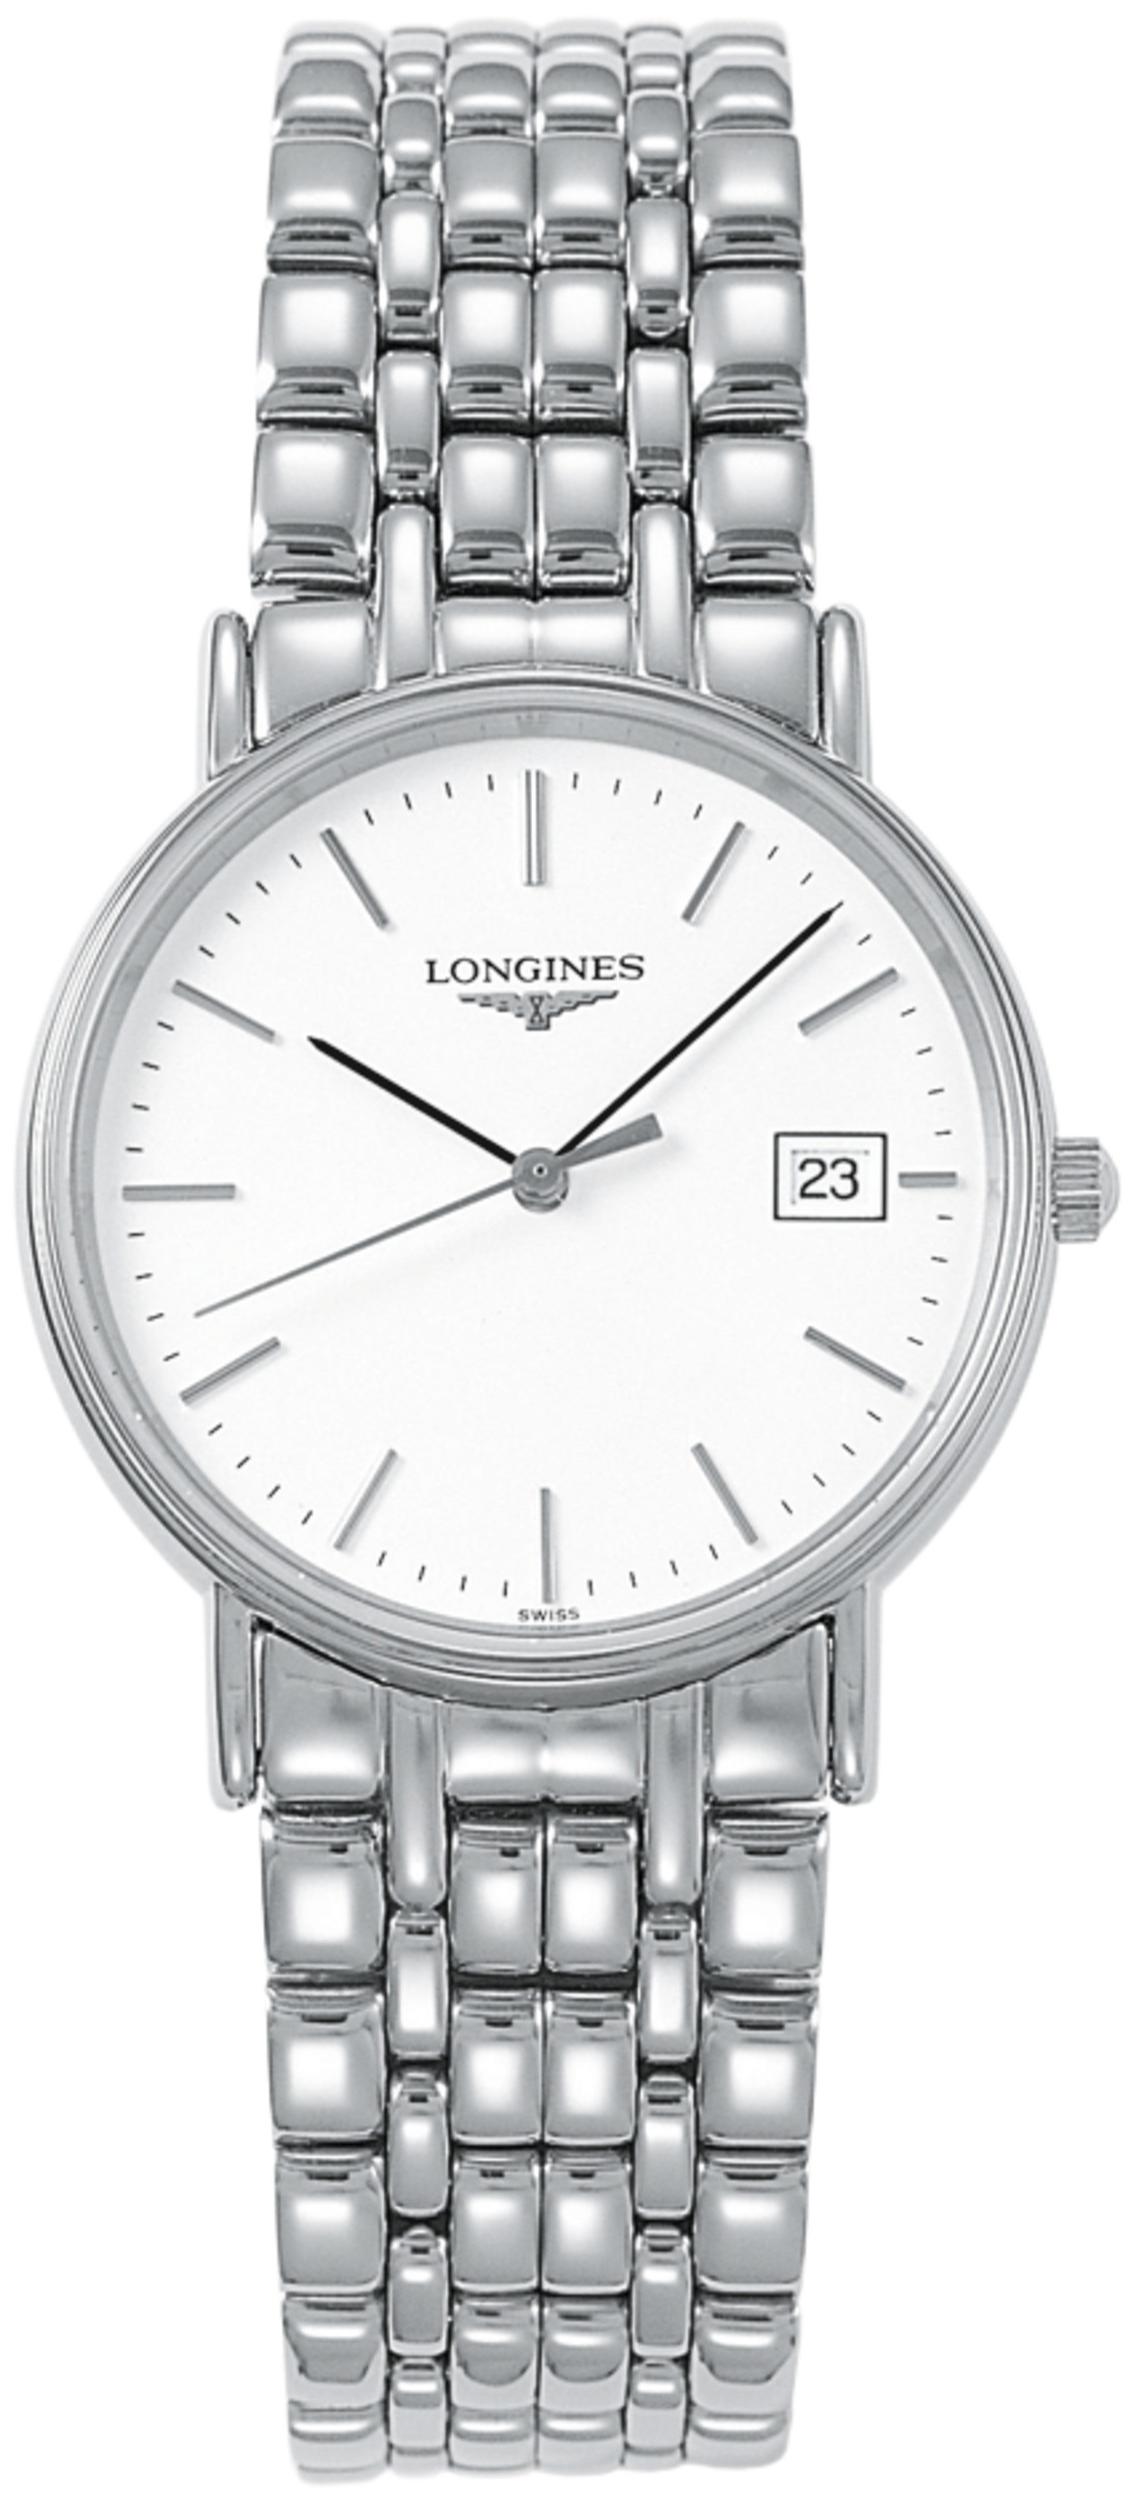 Longines Presences Herreklokke L4.819.4.12.6 Hvit/Stål Ø33 mm - Longines